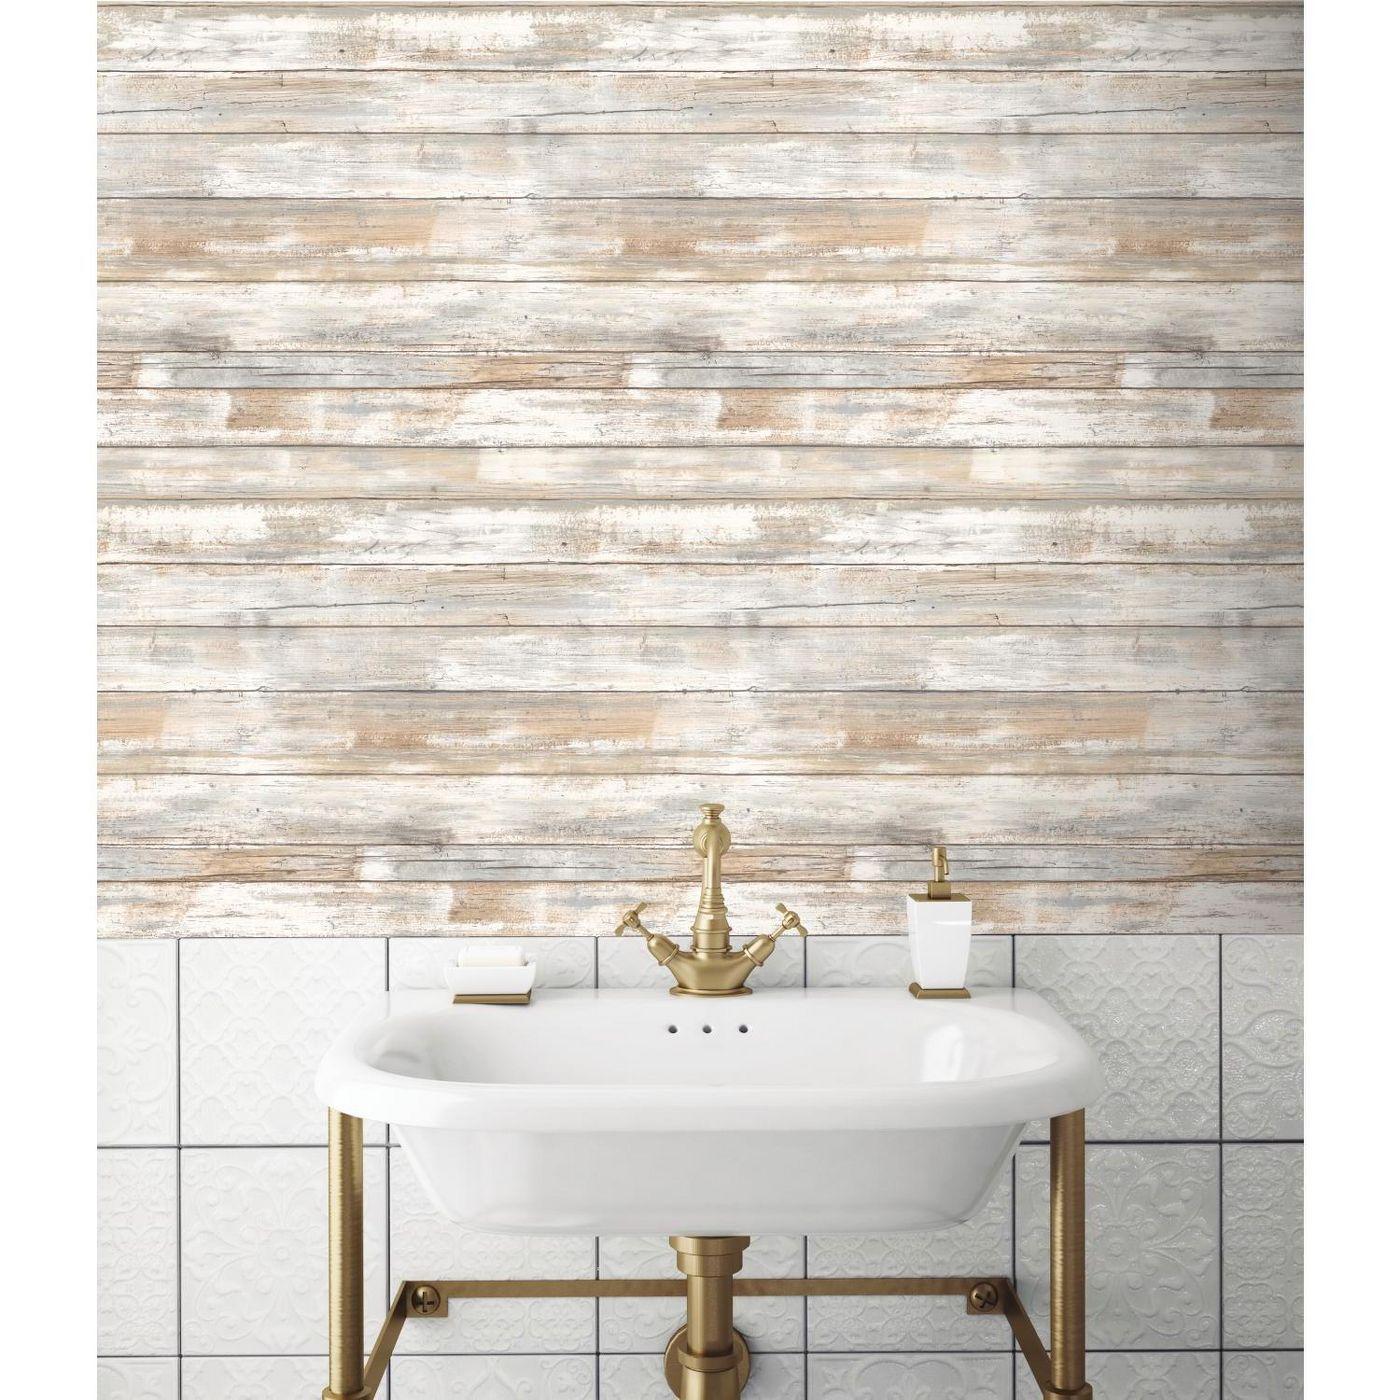 Distressed Wood Peel And Stick Wallpaper Tan RoomMates